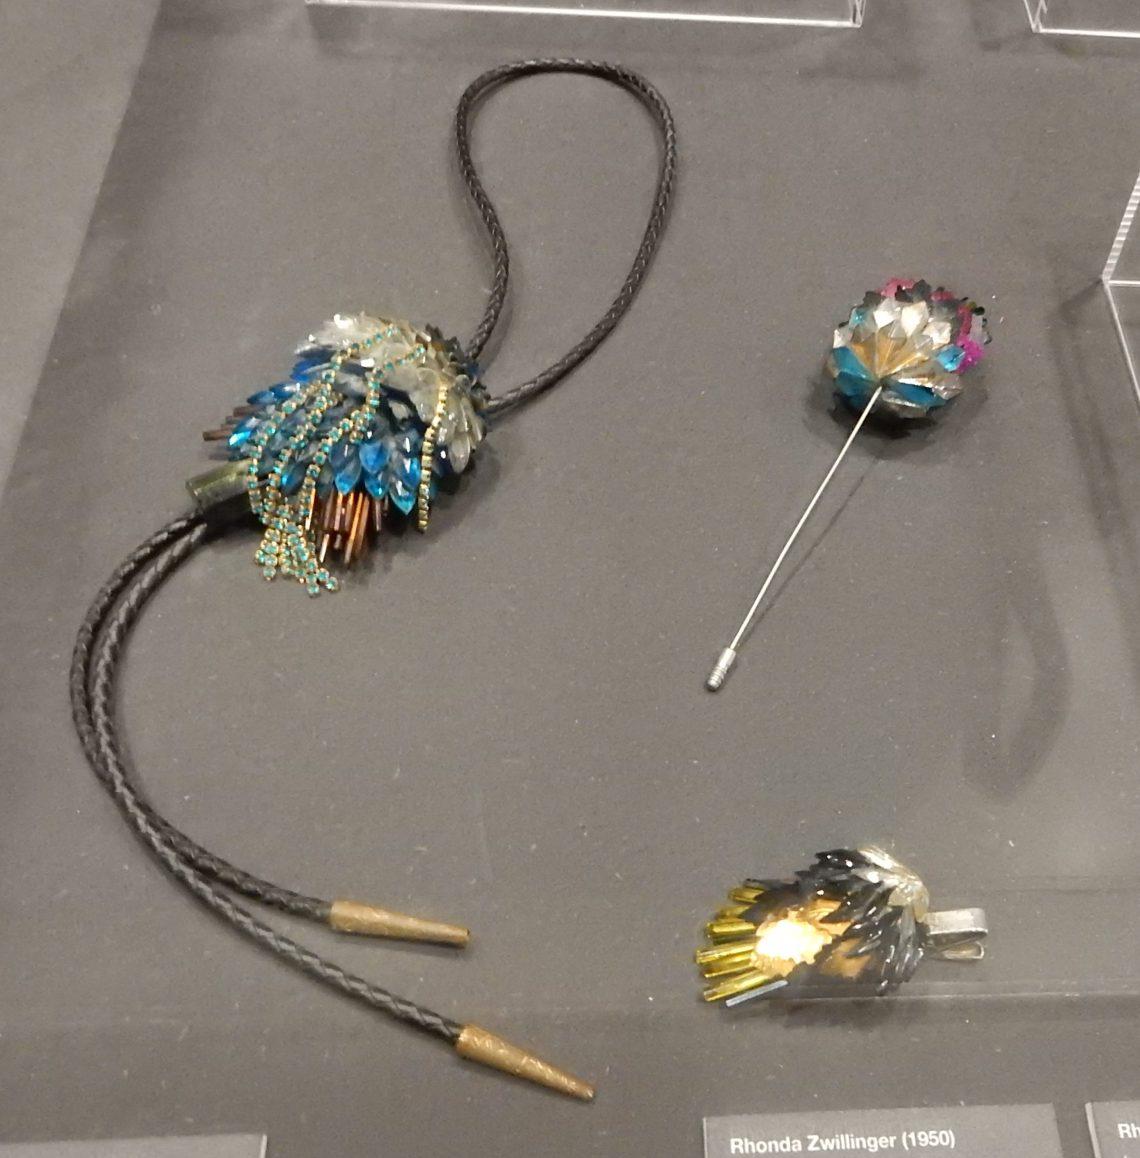 Rhonda Zwillinger, 1989. Show yourself, Design Museum Den Bosch, 2018, Collectie Yvònne Joris. Collectie DMDB. Foto Esther Doornbusch, 28 augustus 2018, CC BY 4.0